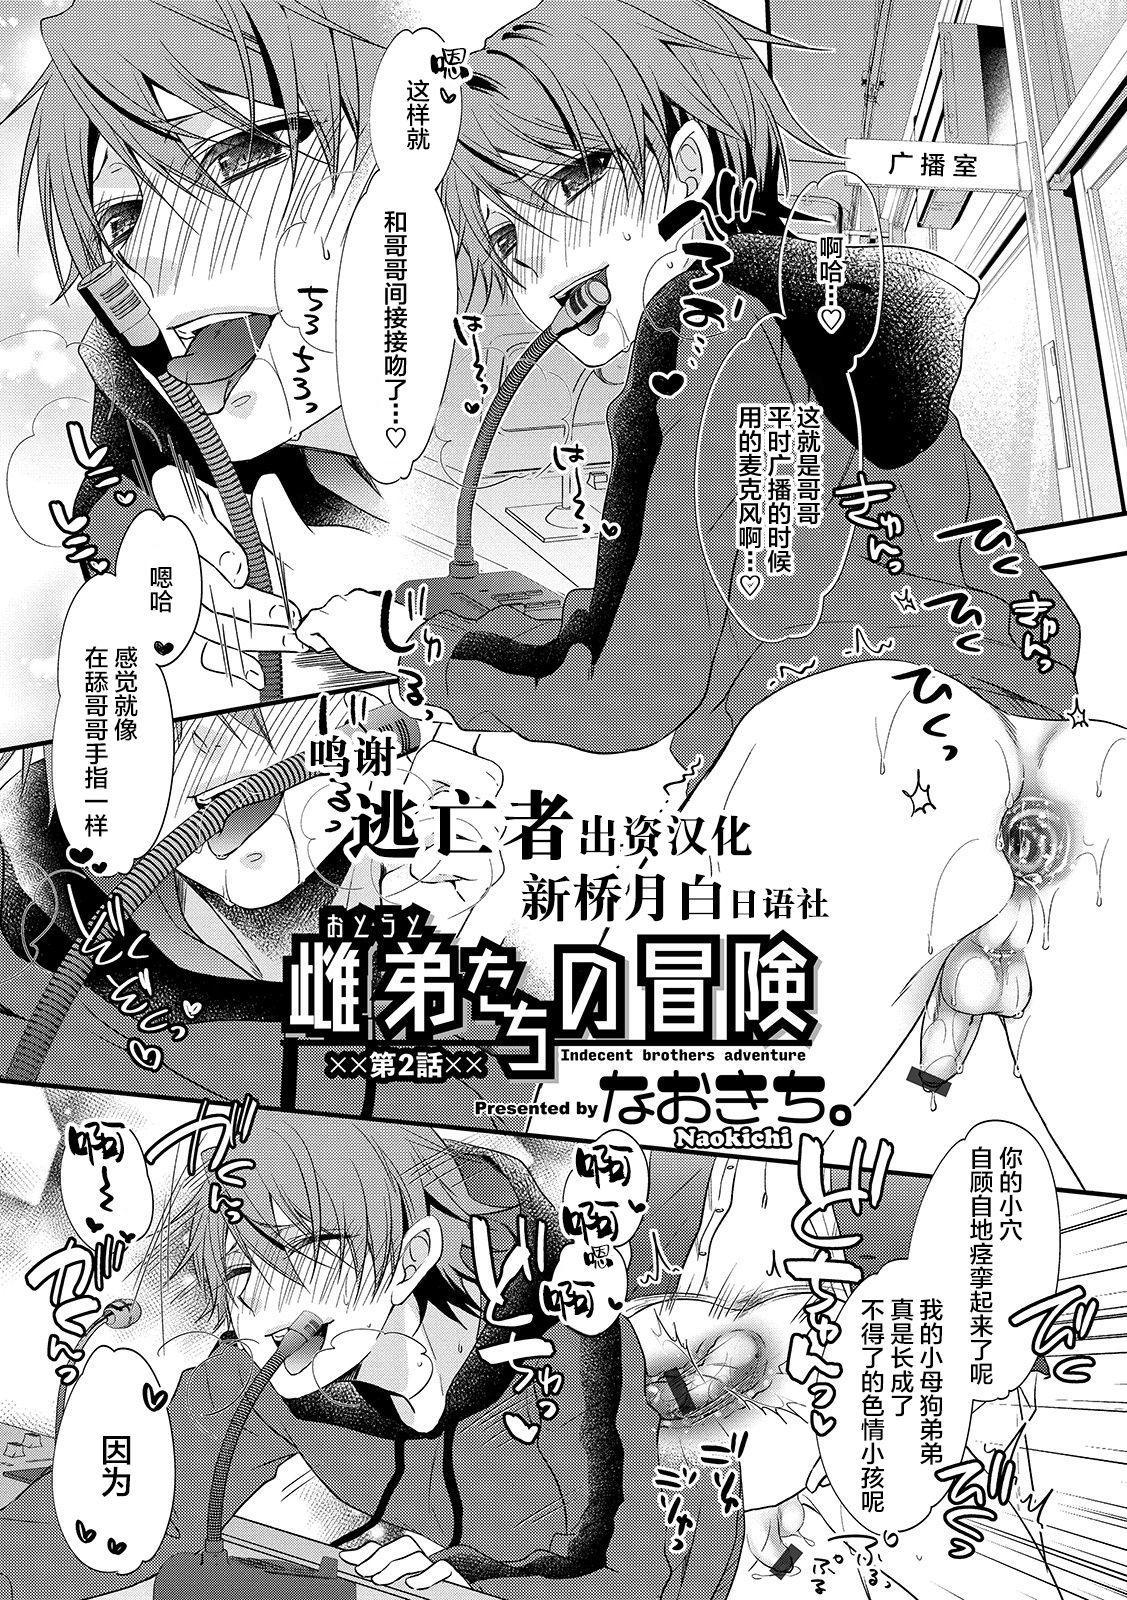 [Naokichi.] Otouto-tachi no Bouken - Indecent brothers adventure Ch. 1-3 [Chinese] [逃亡者×新桥月白日语社] [Digital] 12